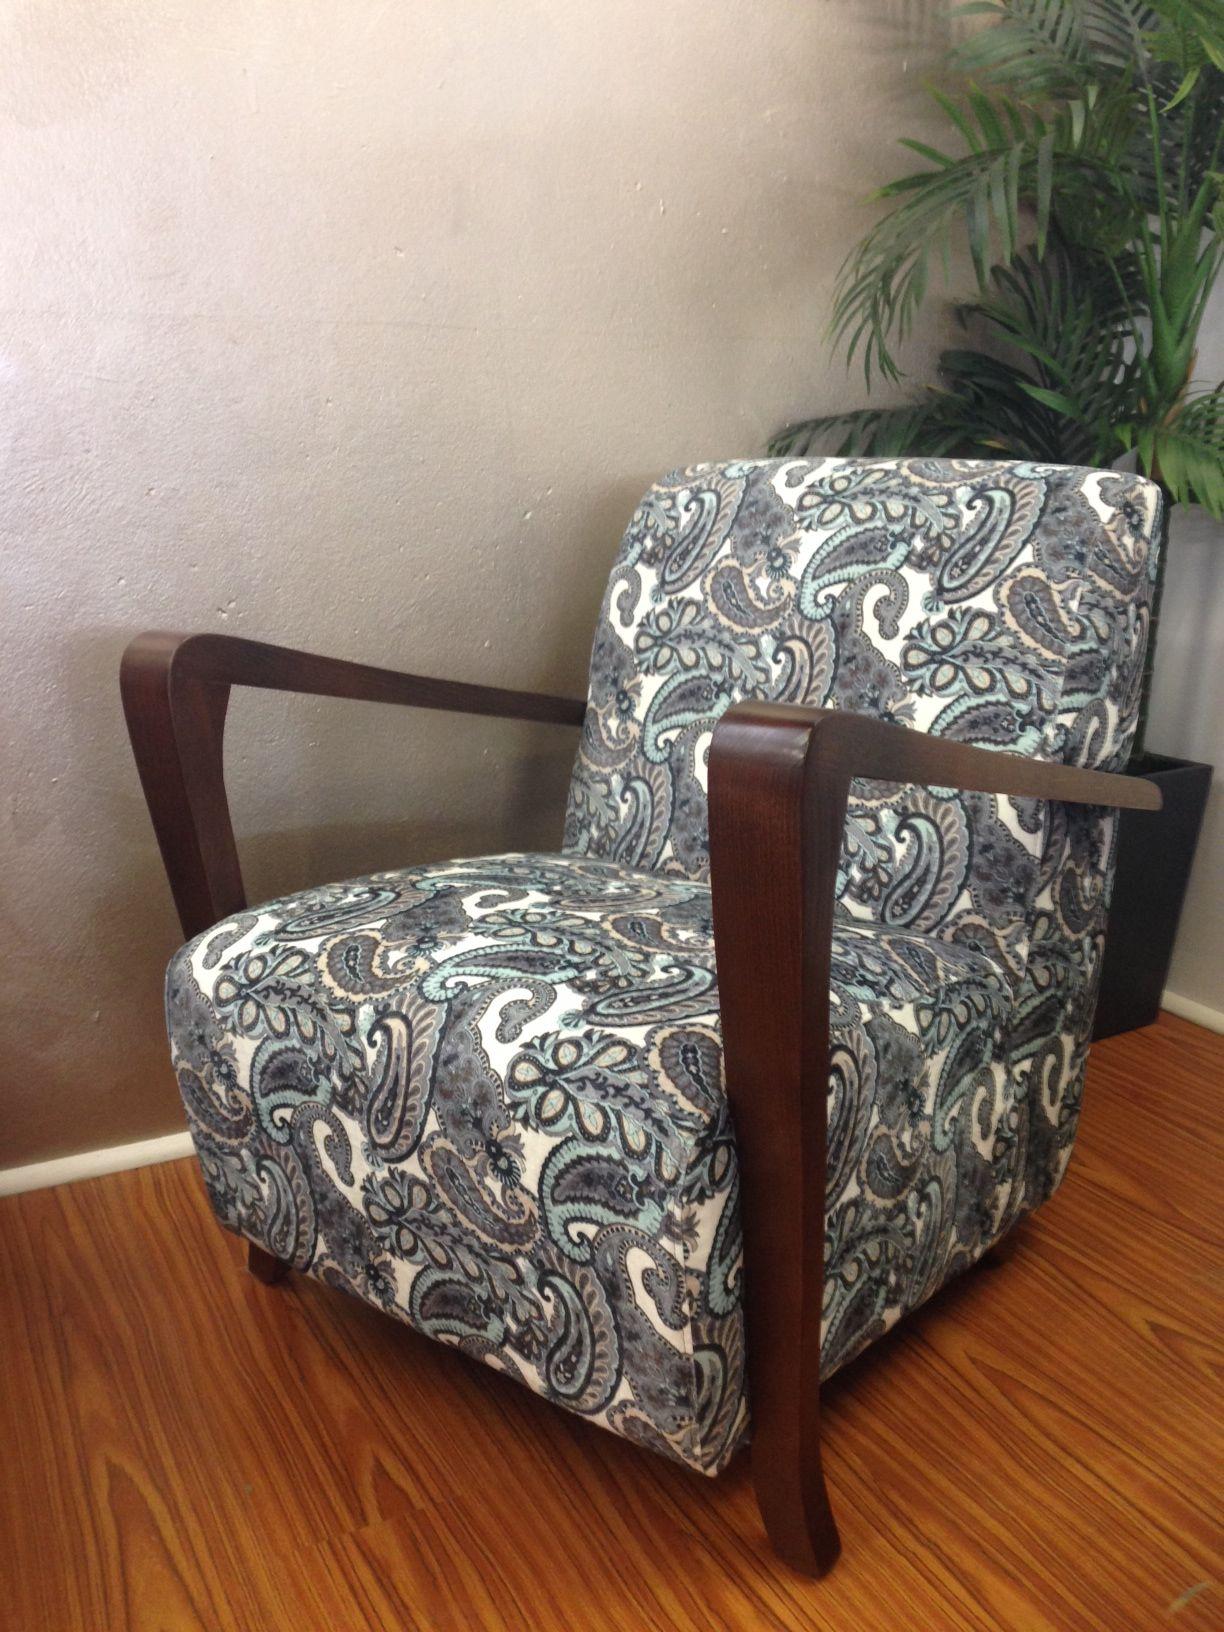 Australian Made 'Retro Chair'. Covered In Mehendi